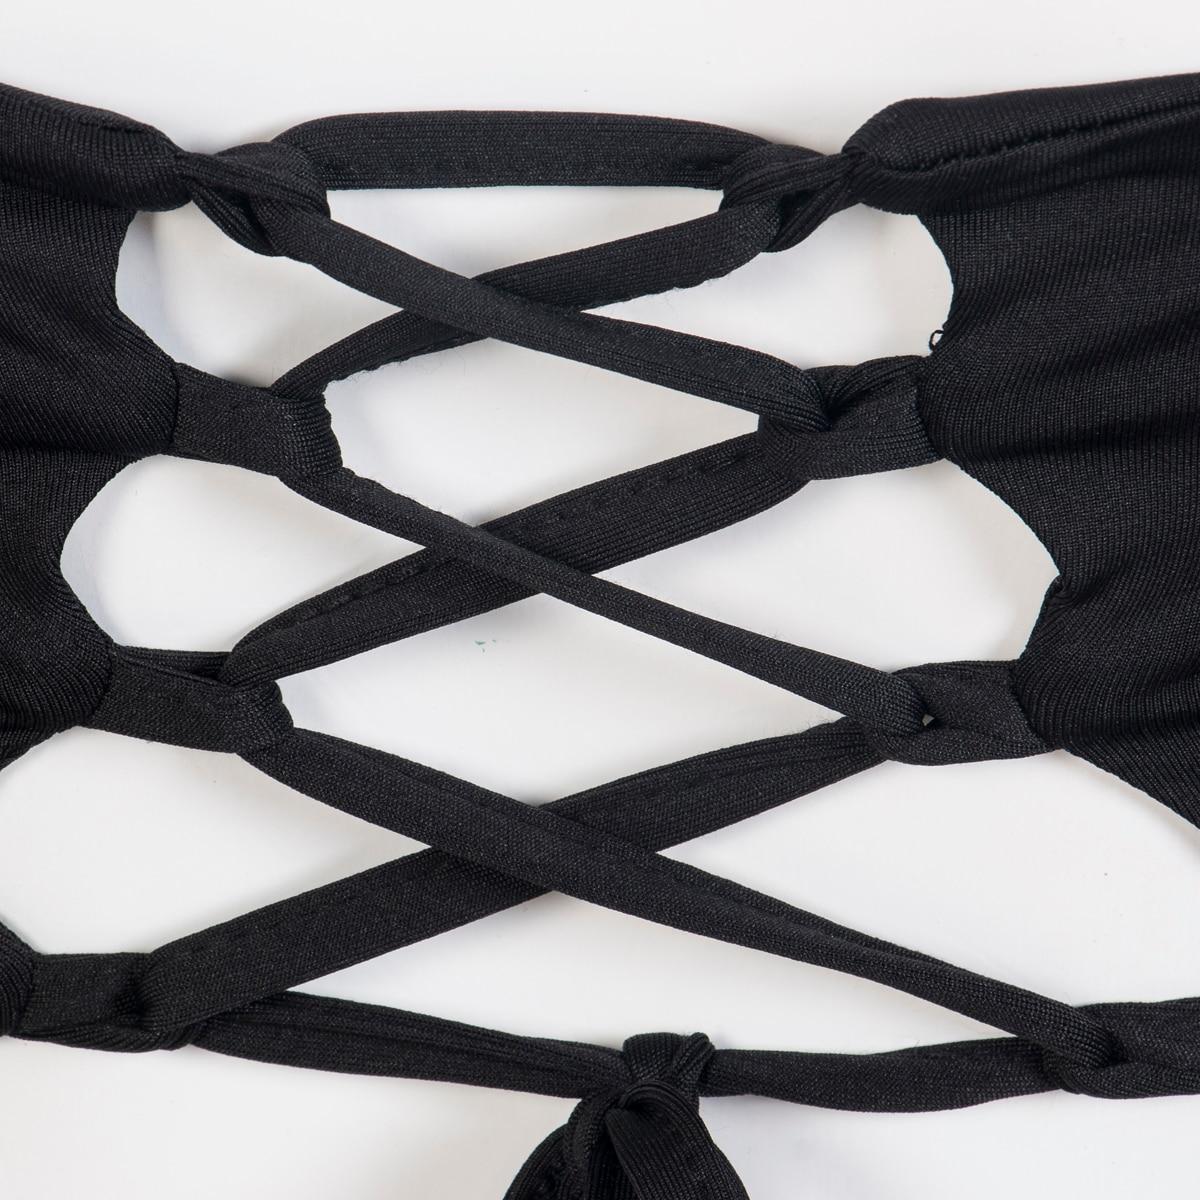 HTB1qPv8naigSKJjSsppq6ybnpXa2 Hirigin Women's Summer Long Sleeve Slash Neck Hollow Bandage Bodycon Night Club Party Dress